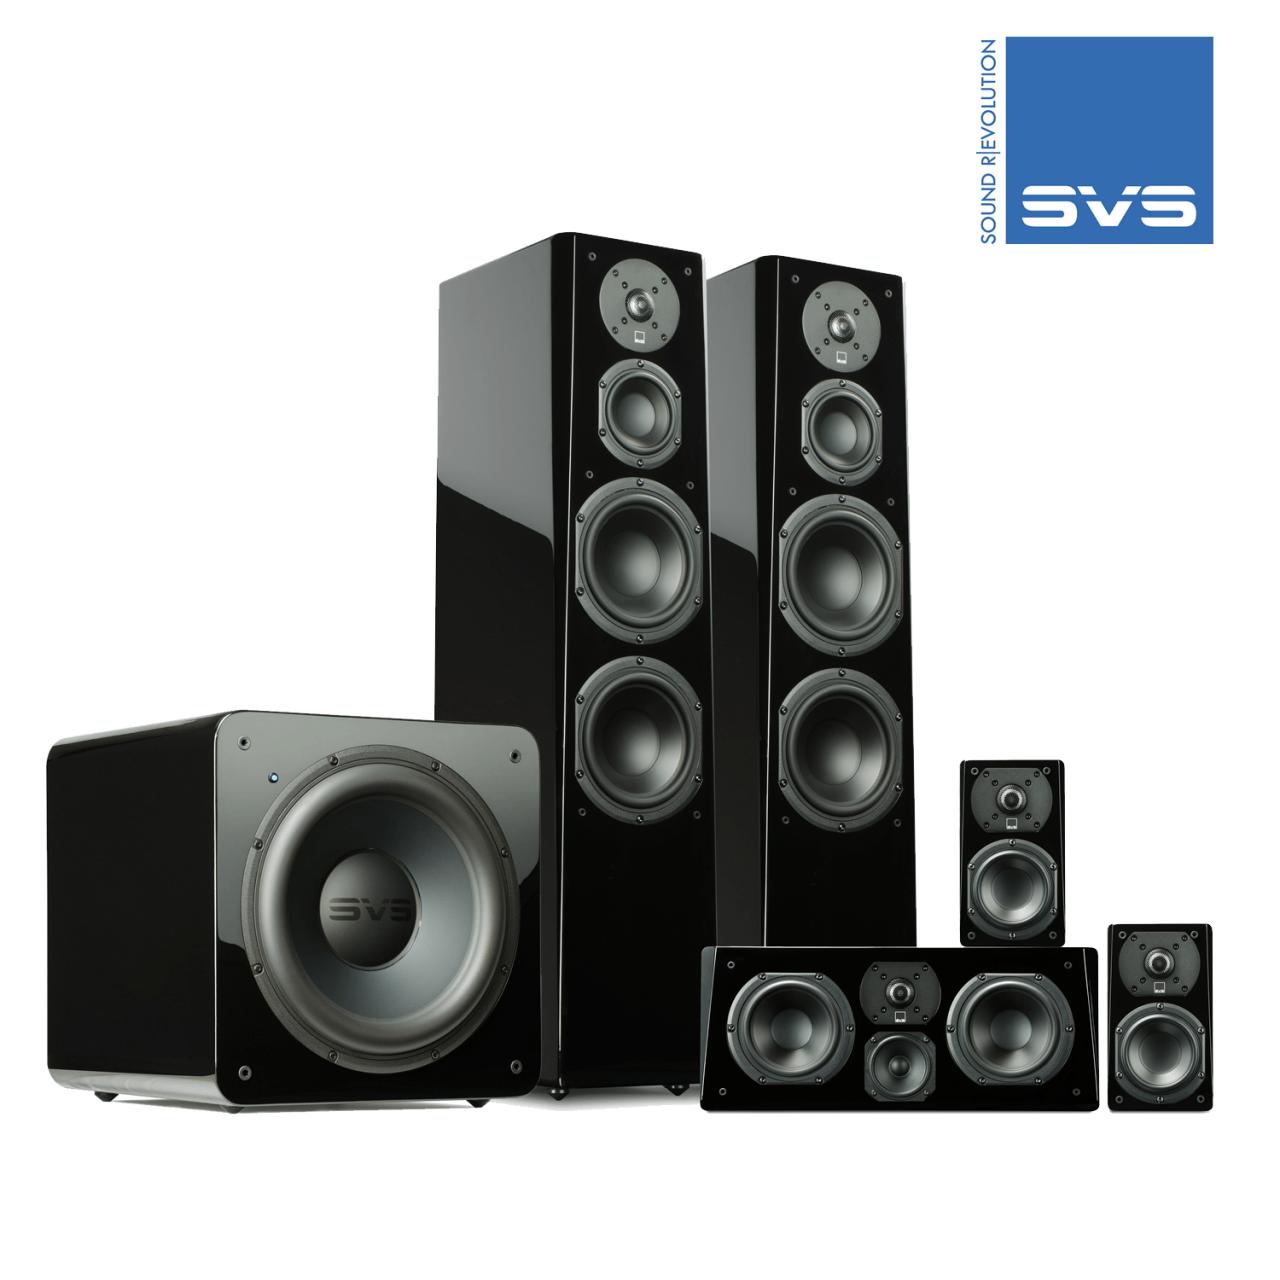 SVS-Prime-5.1-Audiophile-házimozi-hangfalszett